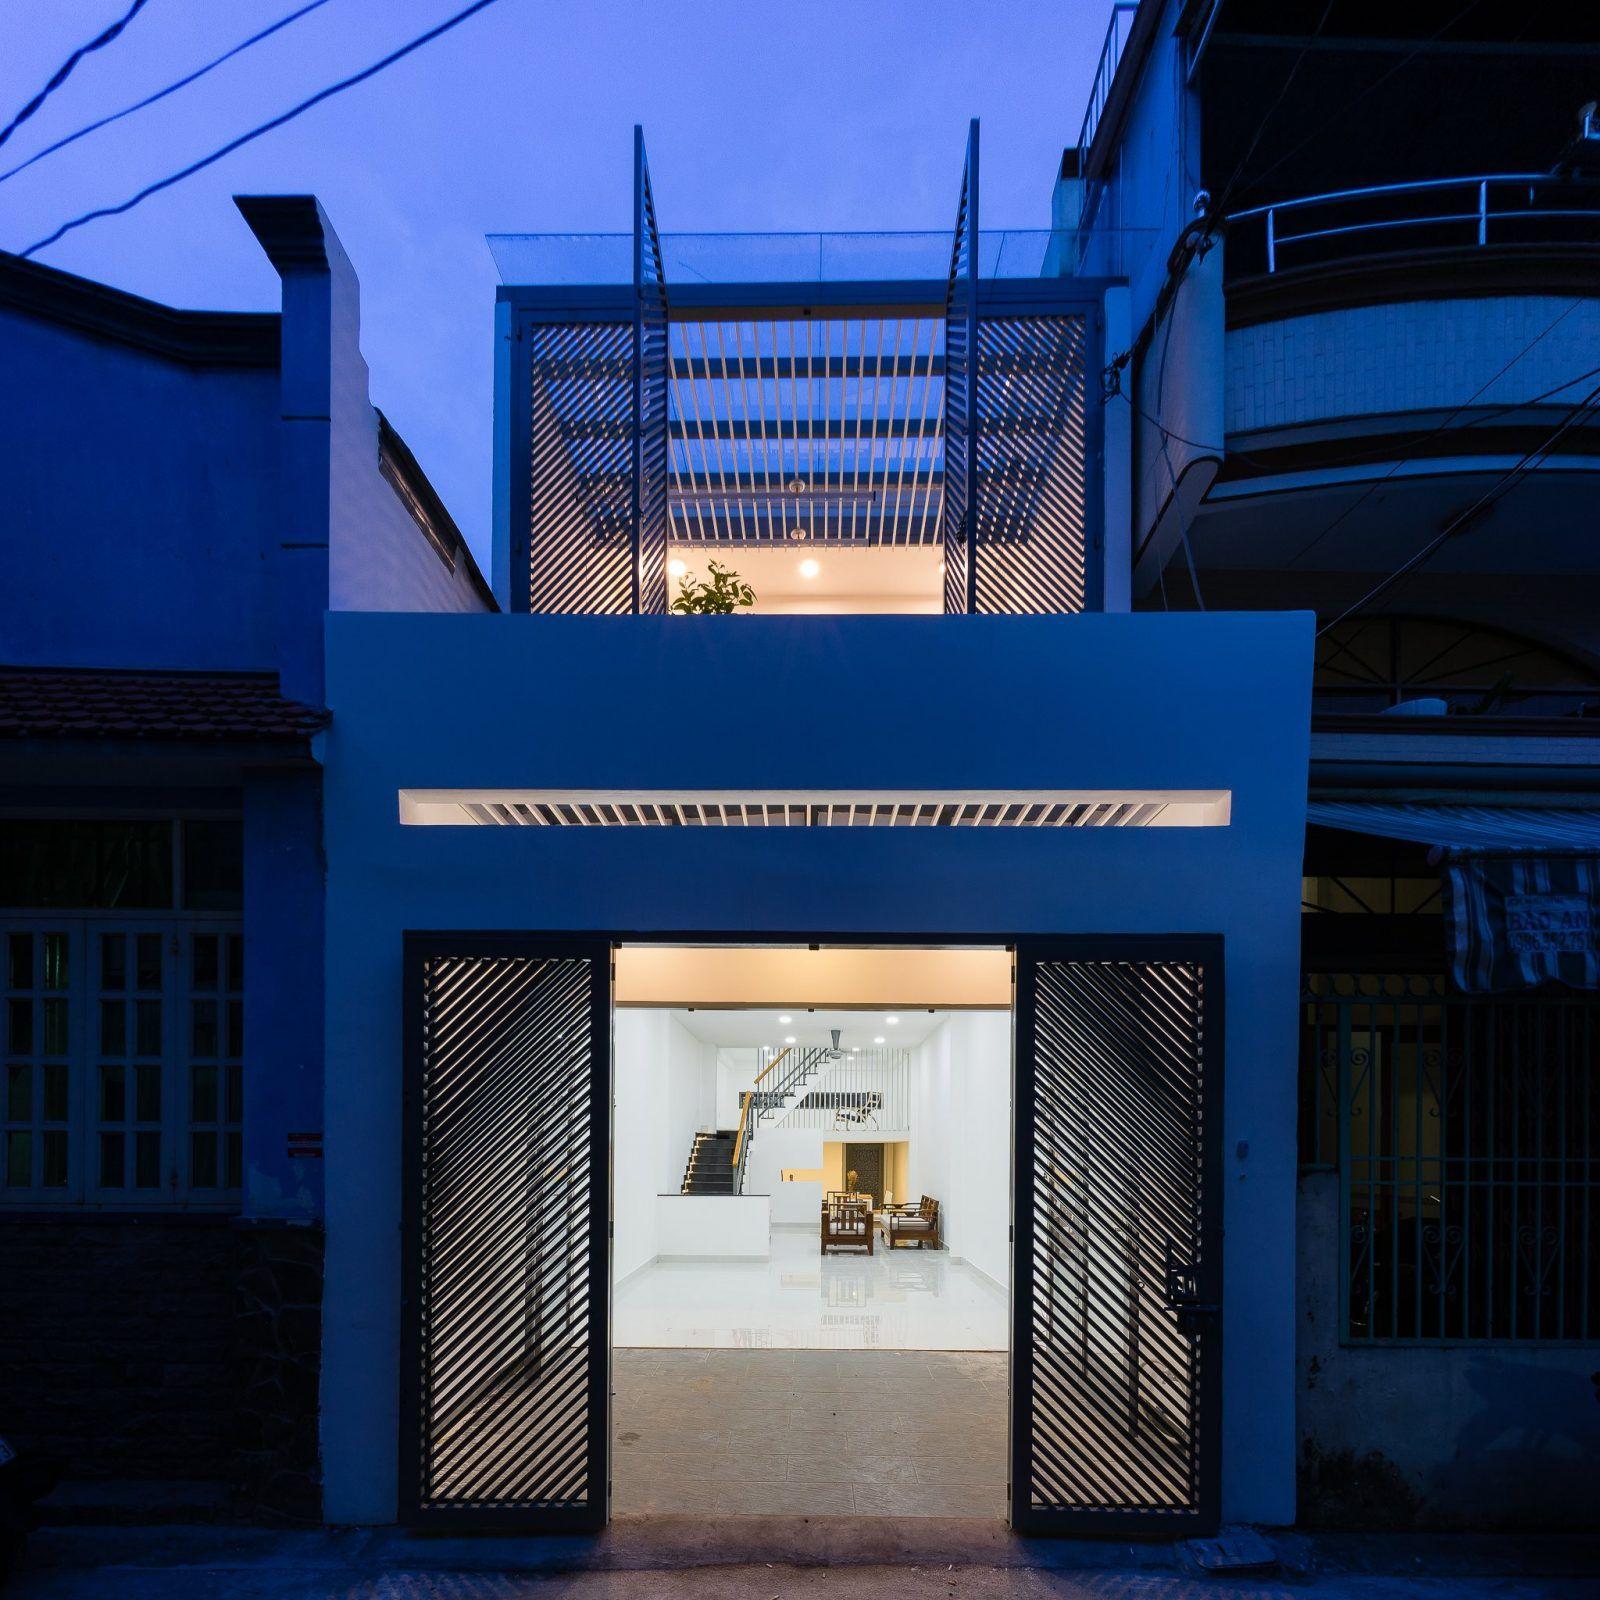 42O house | 4O sqm . location: tanphu district, hcmc, vietnam. sawa ...